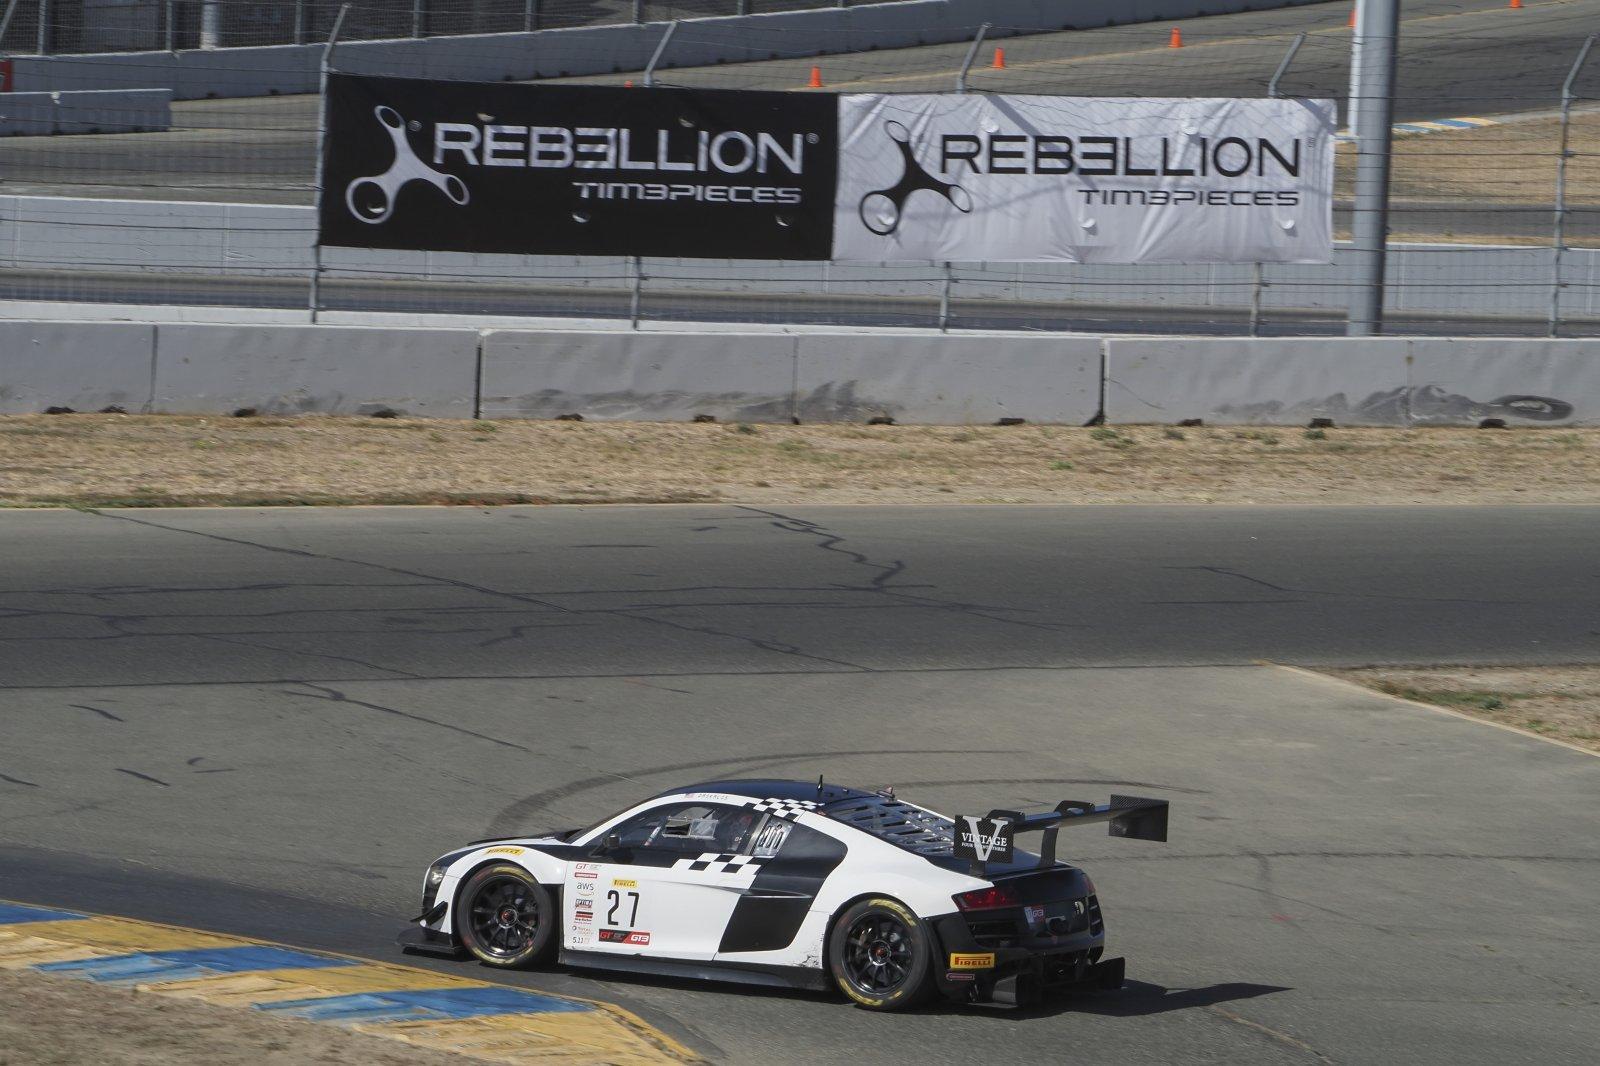 #27 Audi R8 LMS of Jason Daskalos, Daskalos Motorsports, GT Sports Club, SRO America, Sonoma Raceway, Sonoma CA, Aug 2020.